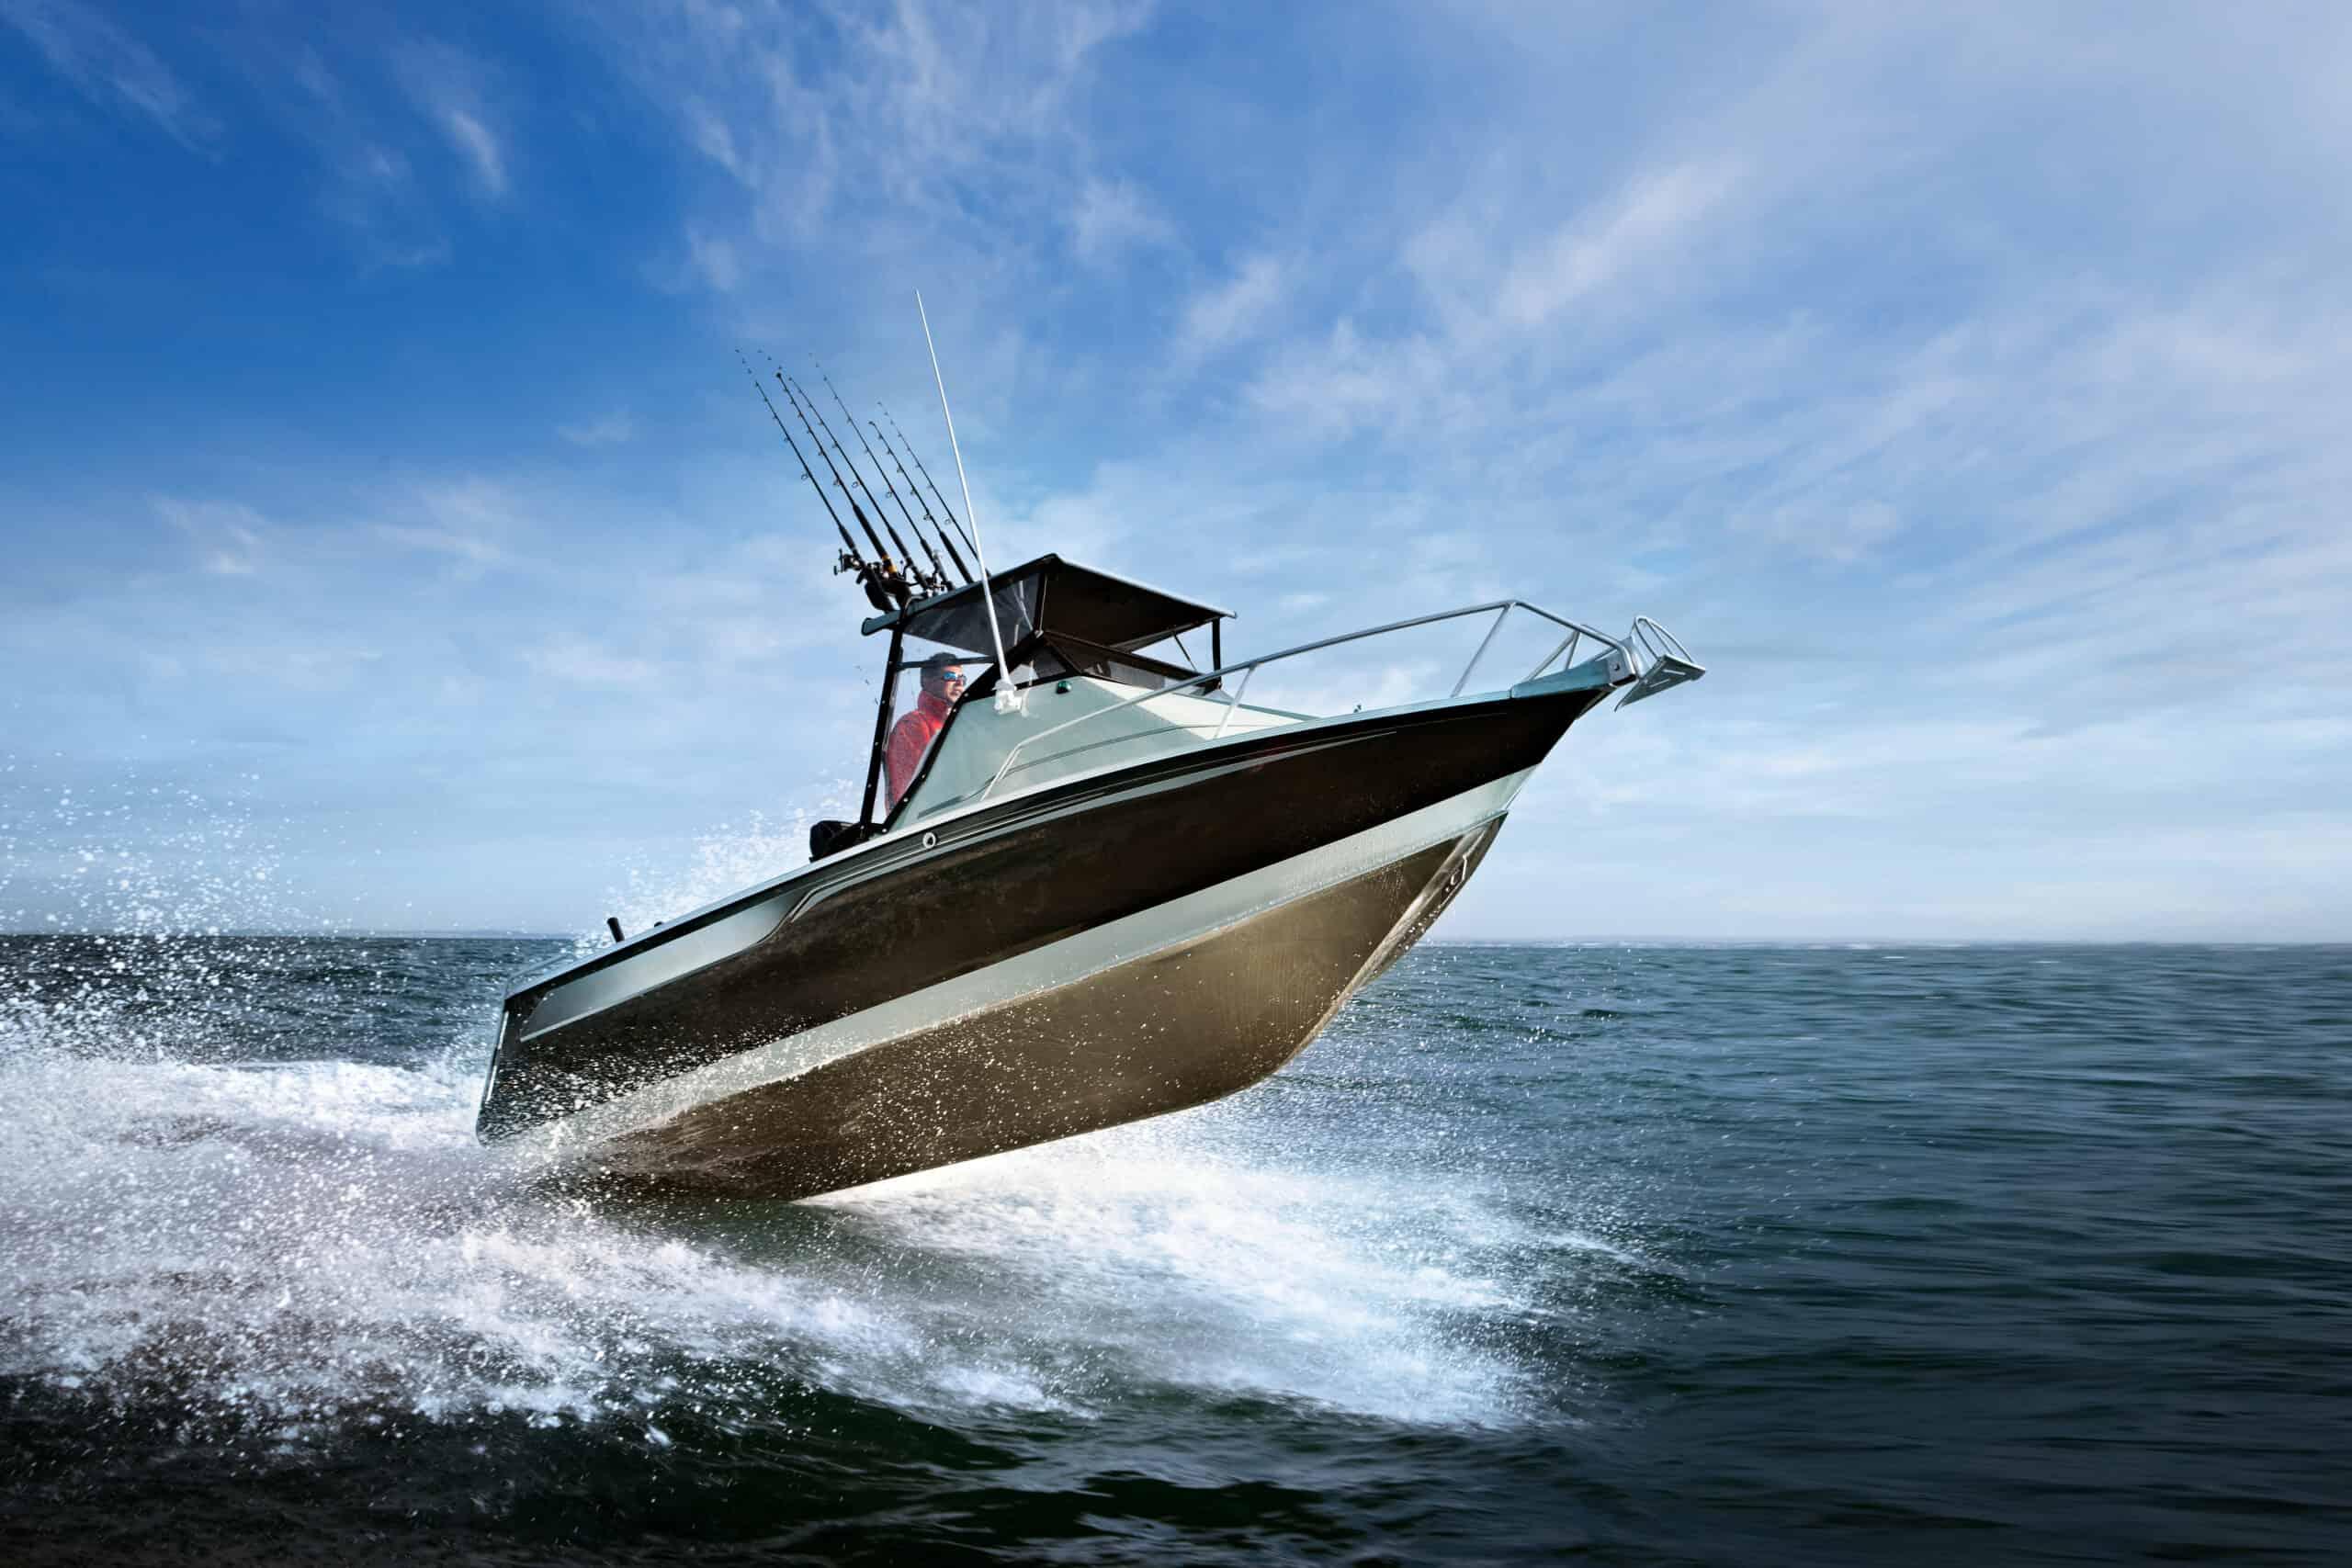 speed-boat-8F7HTEB